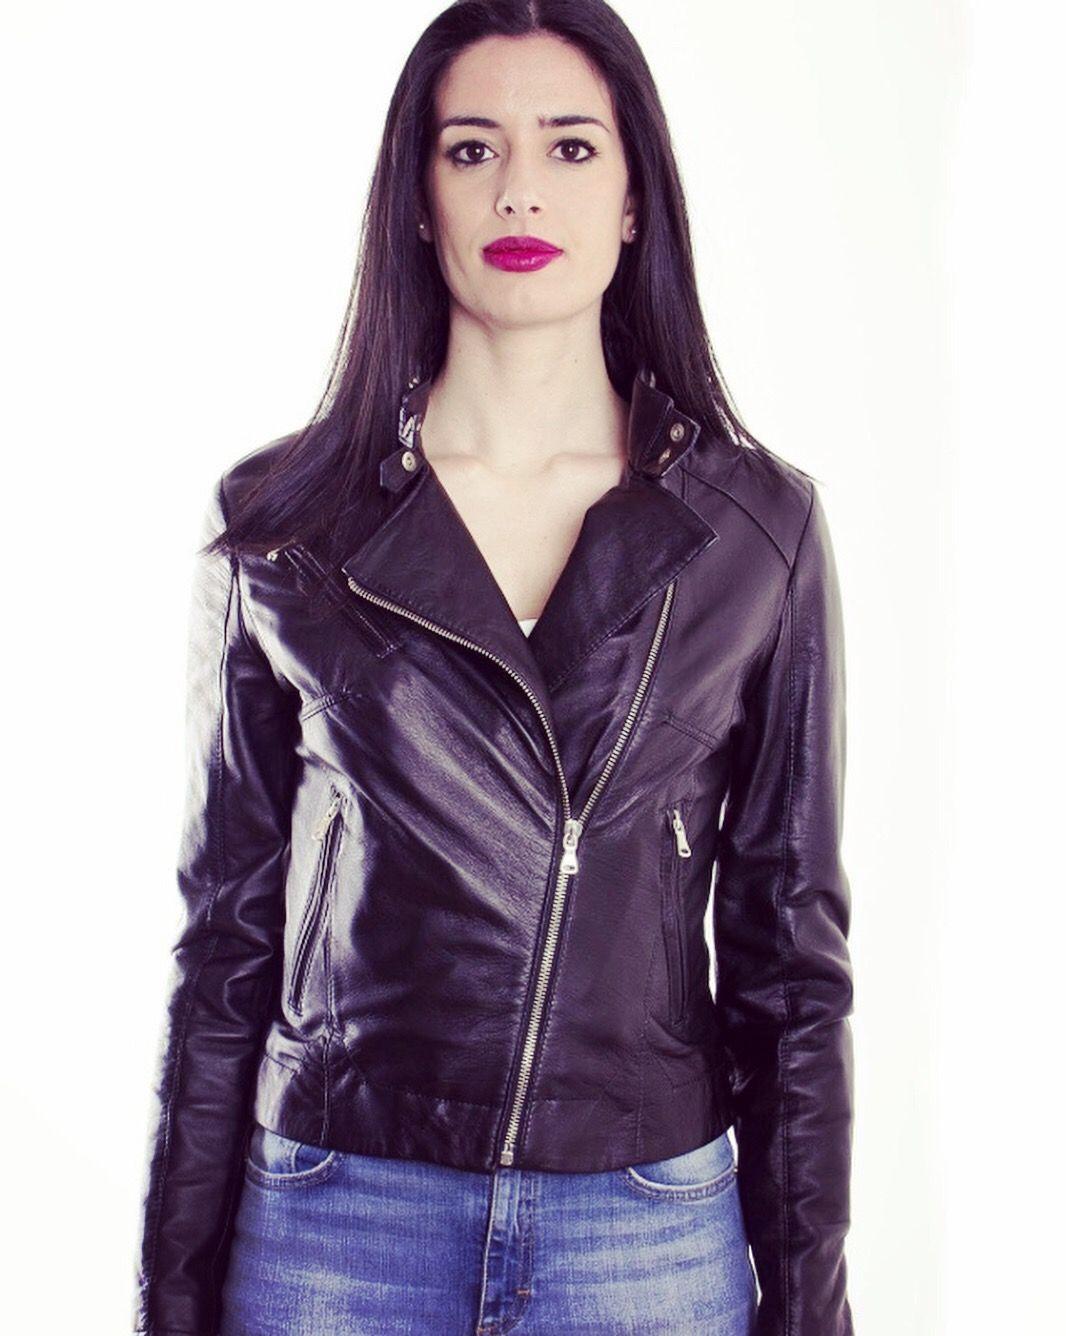 Emily slimfit women's black lambskin leather jacket. AUD